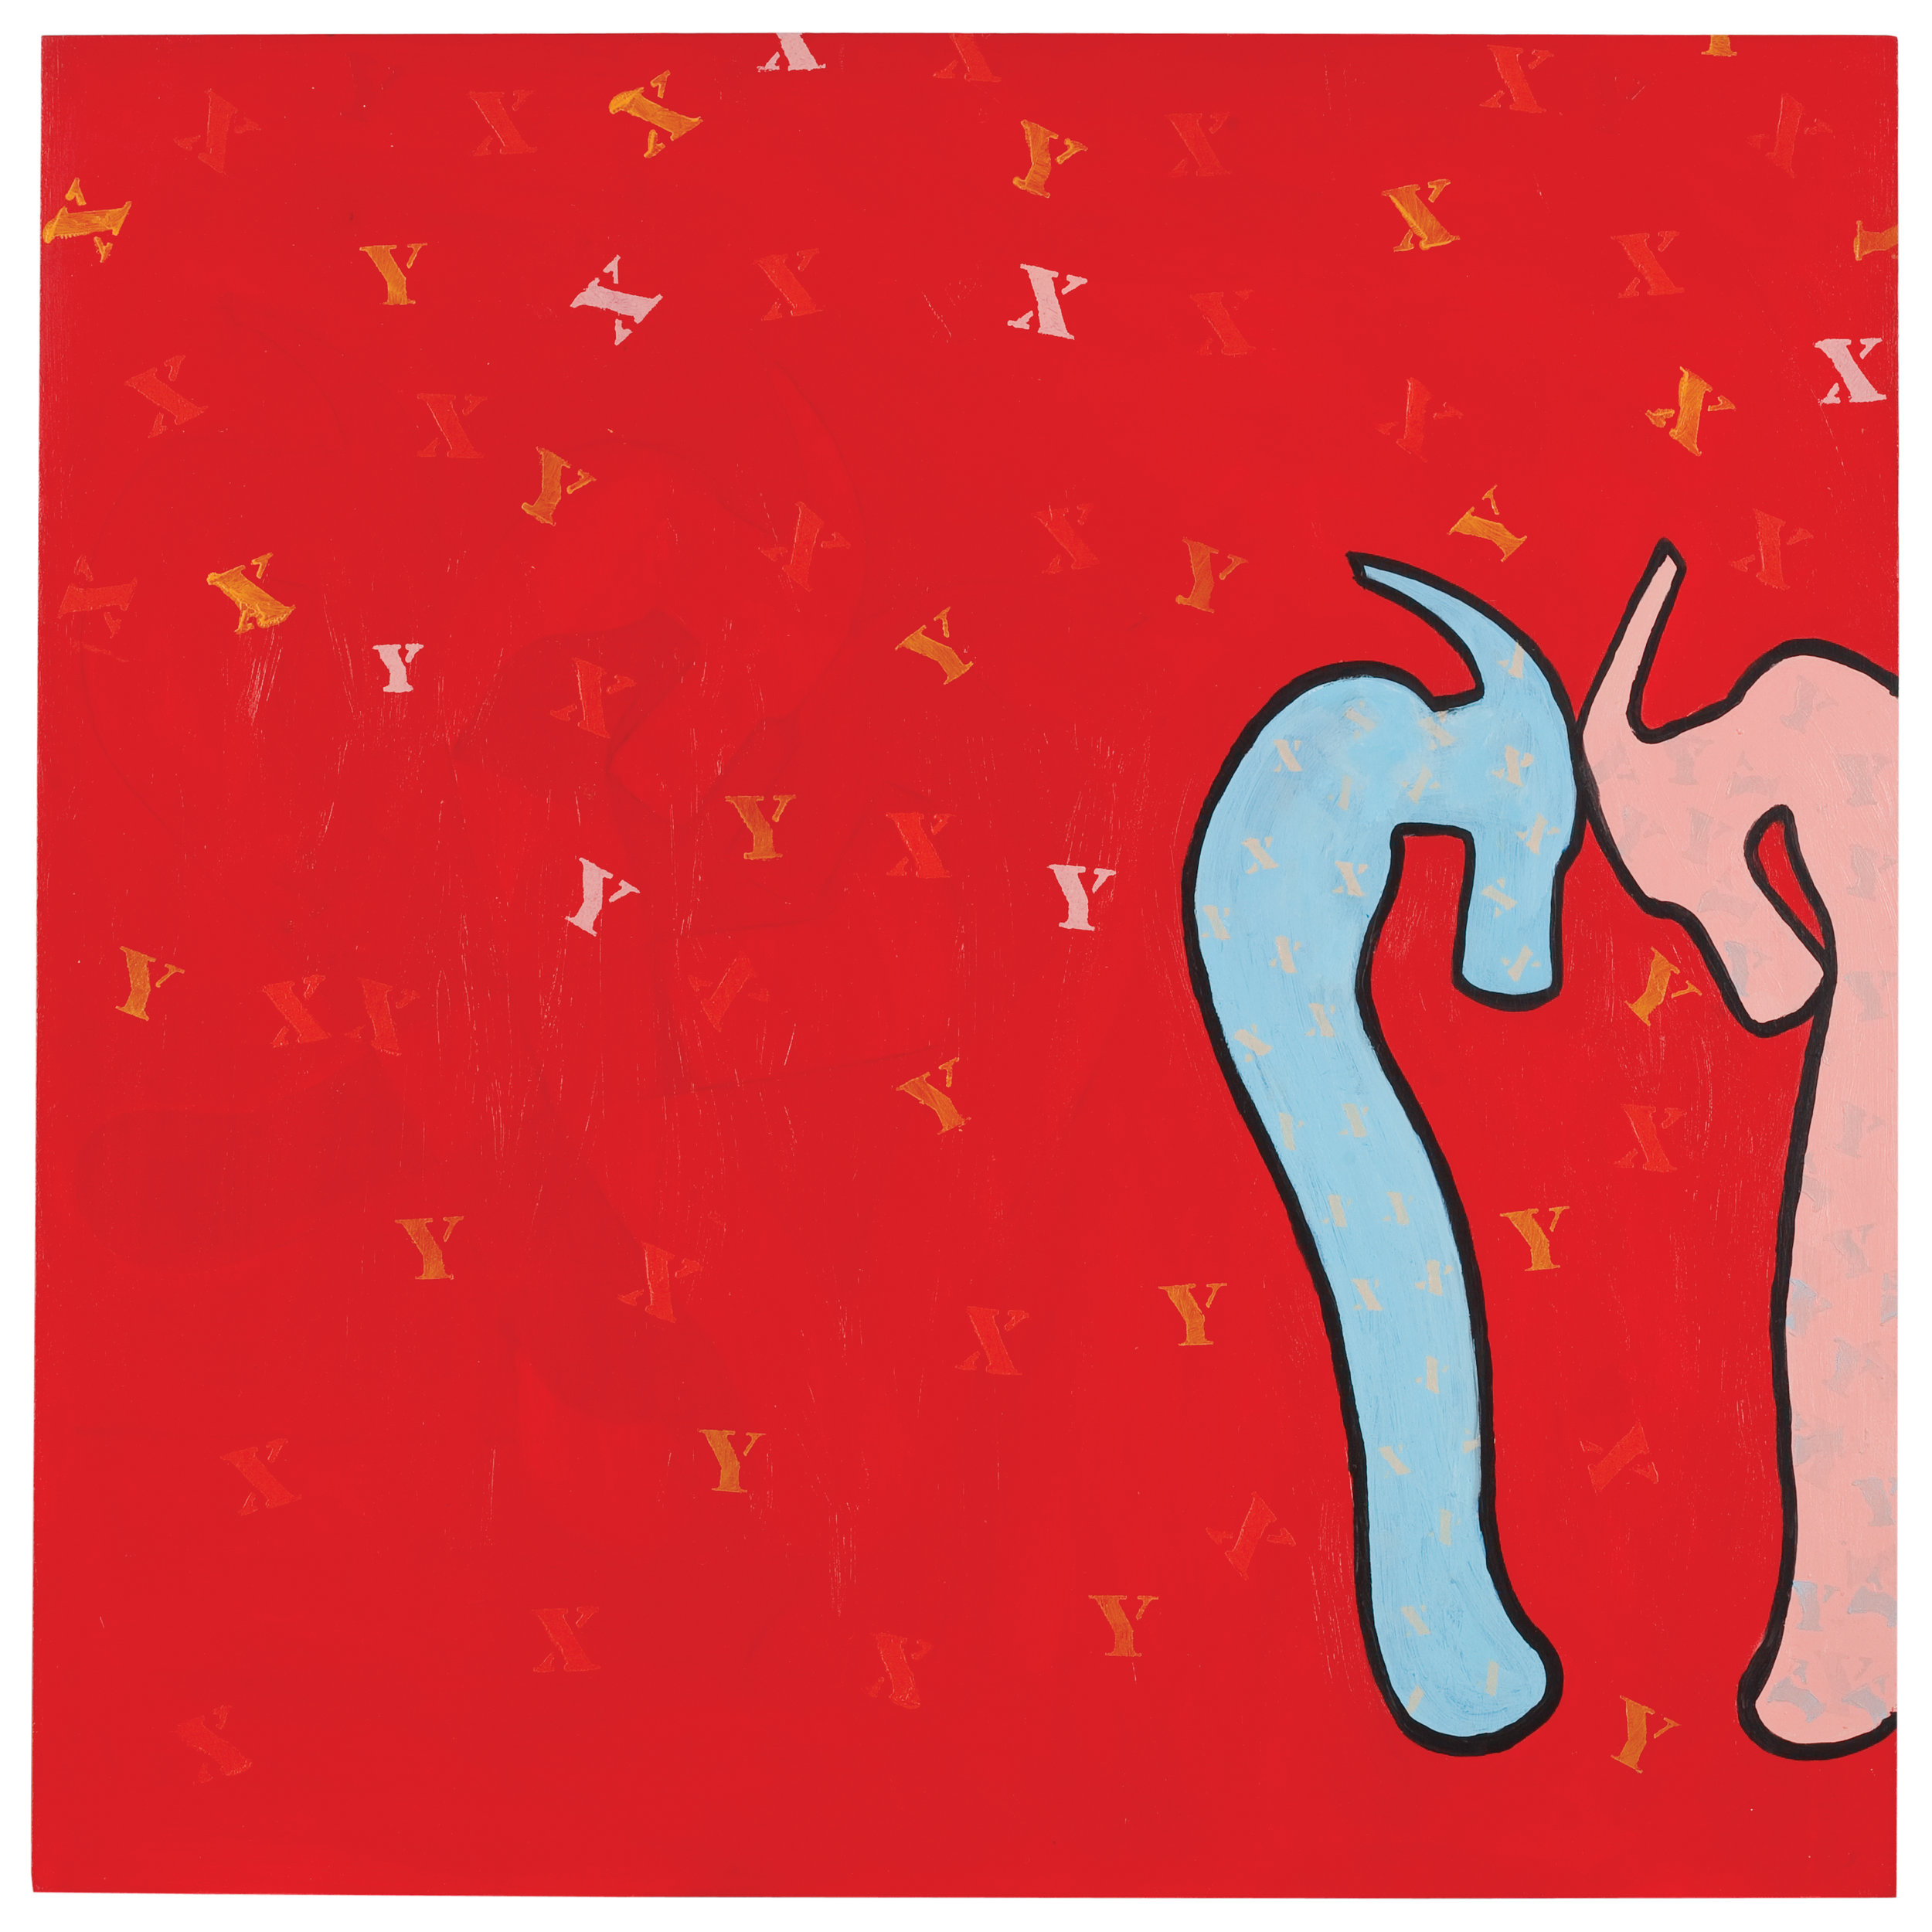 "XX YY XY (Falling in Love)   acrylic on plywood  30 x 30""  2012"